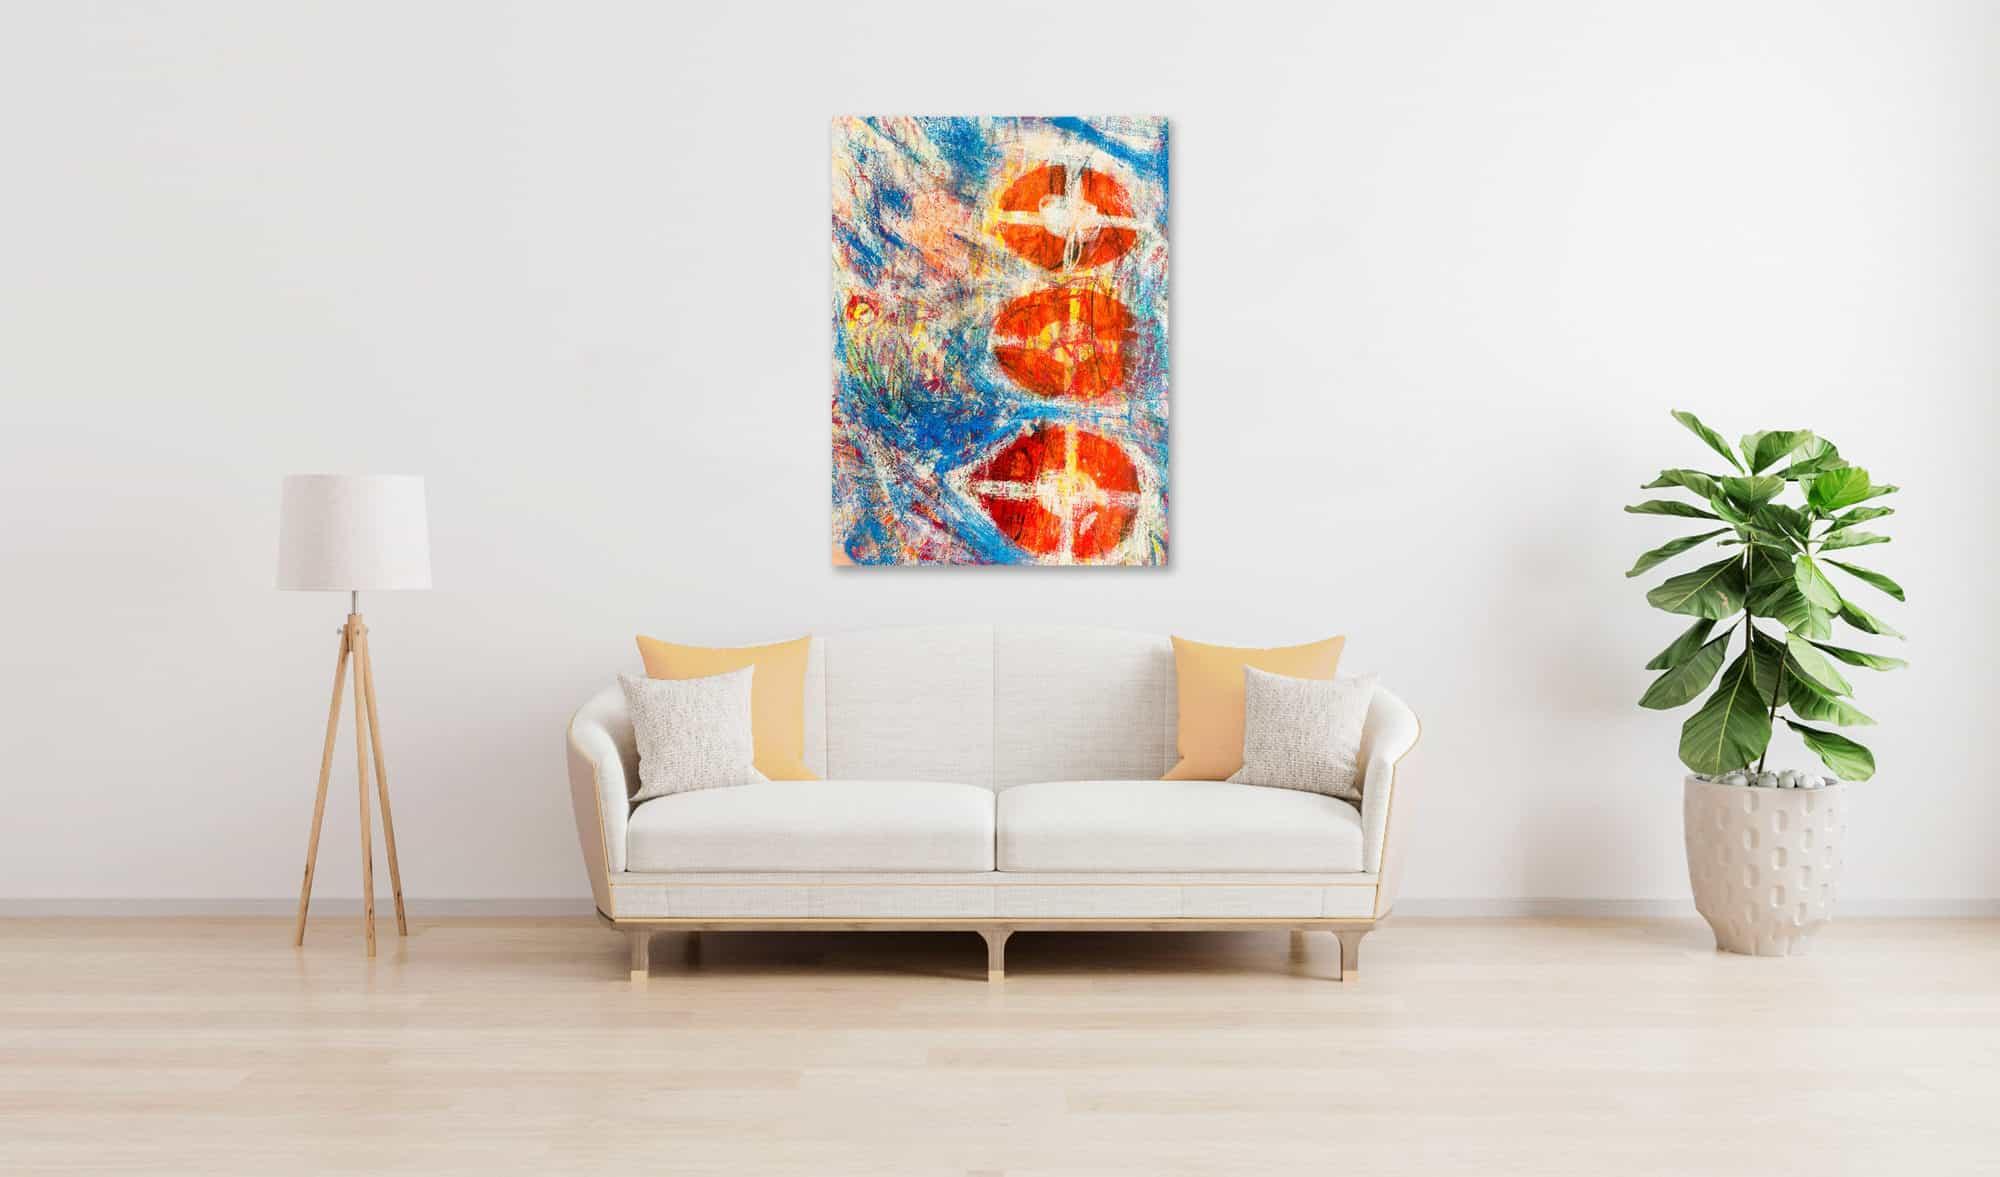 Abstraktes Acrylbild Rote runde Formen mit Blau wandbild